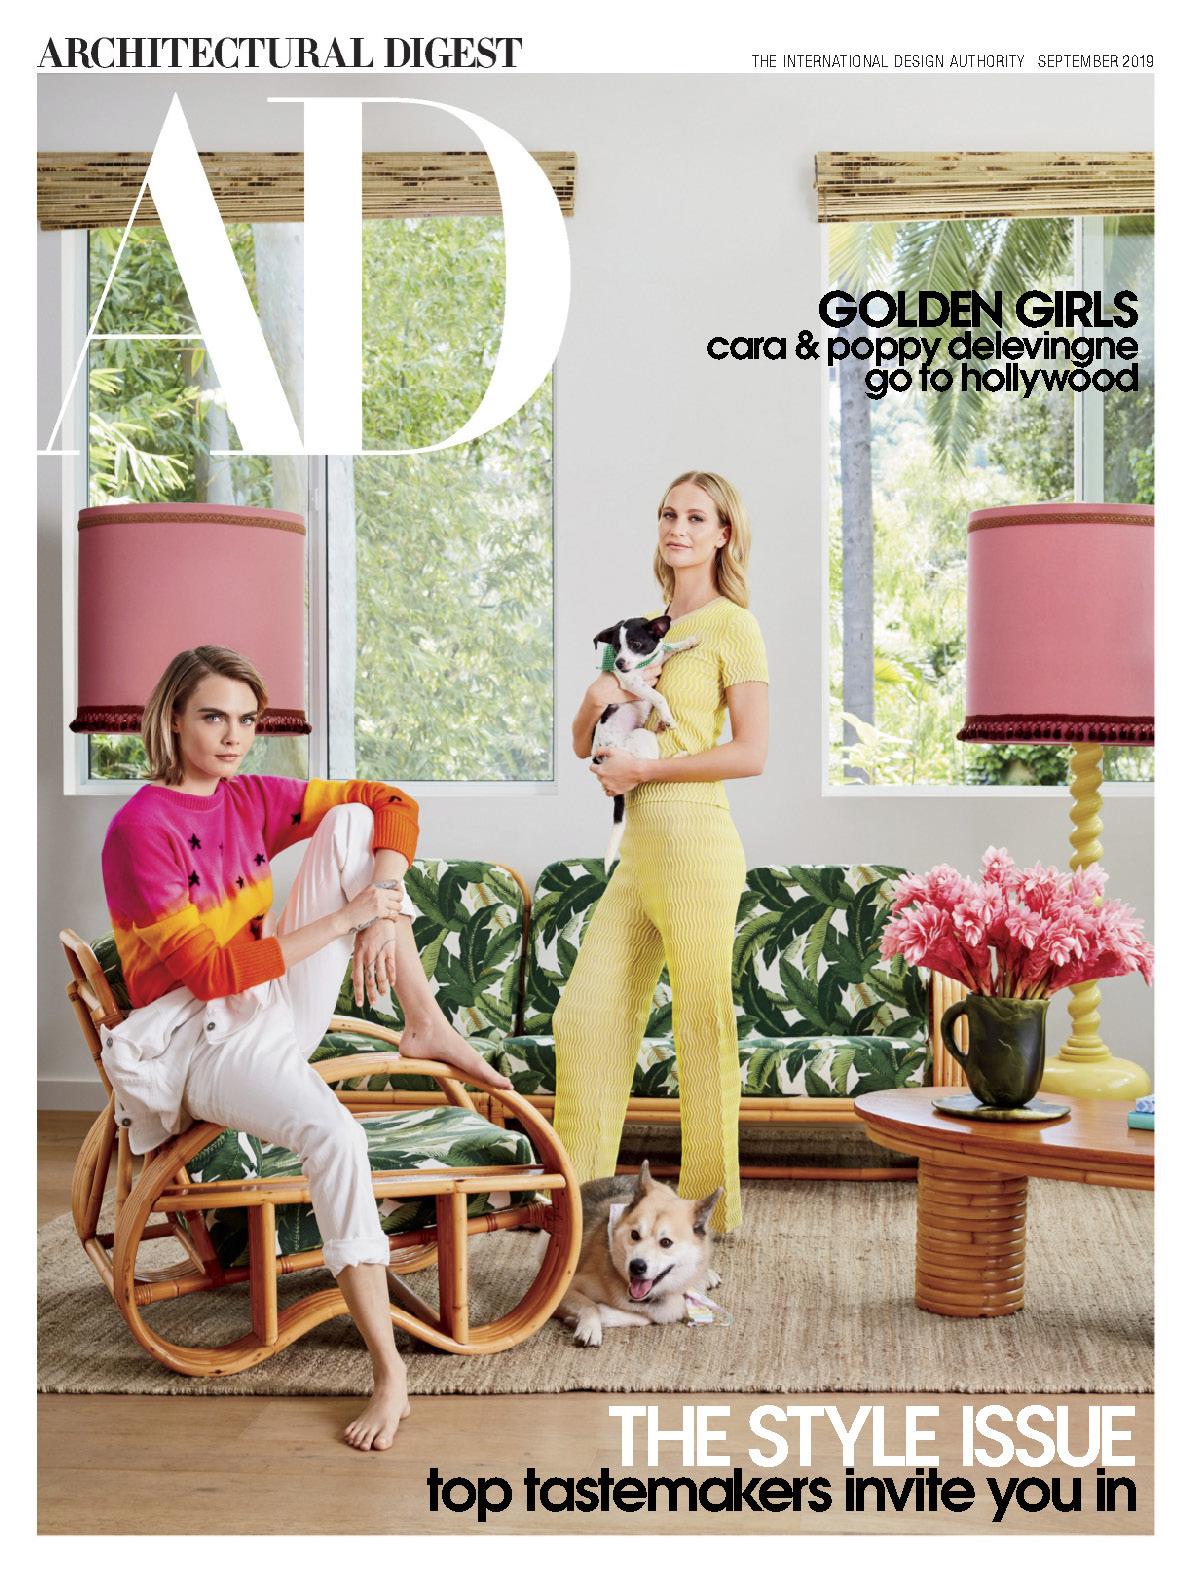 《AD》美国版室内室外设计杂志2019年09月号